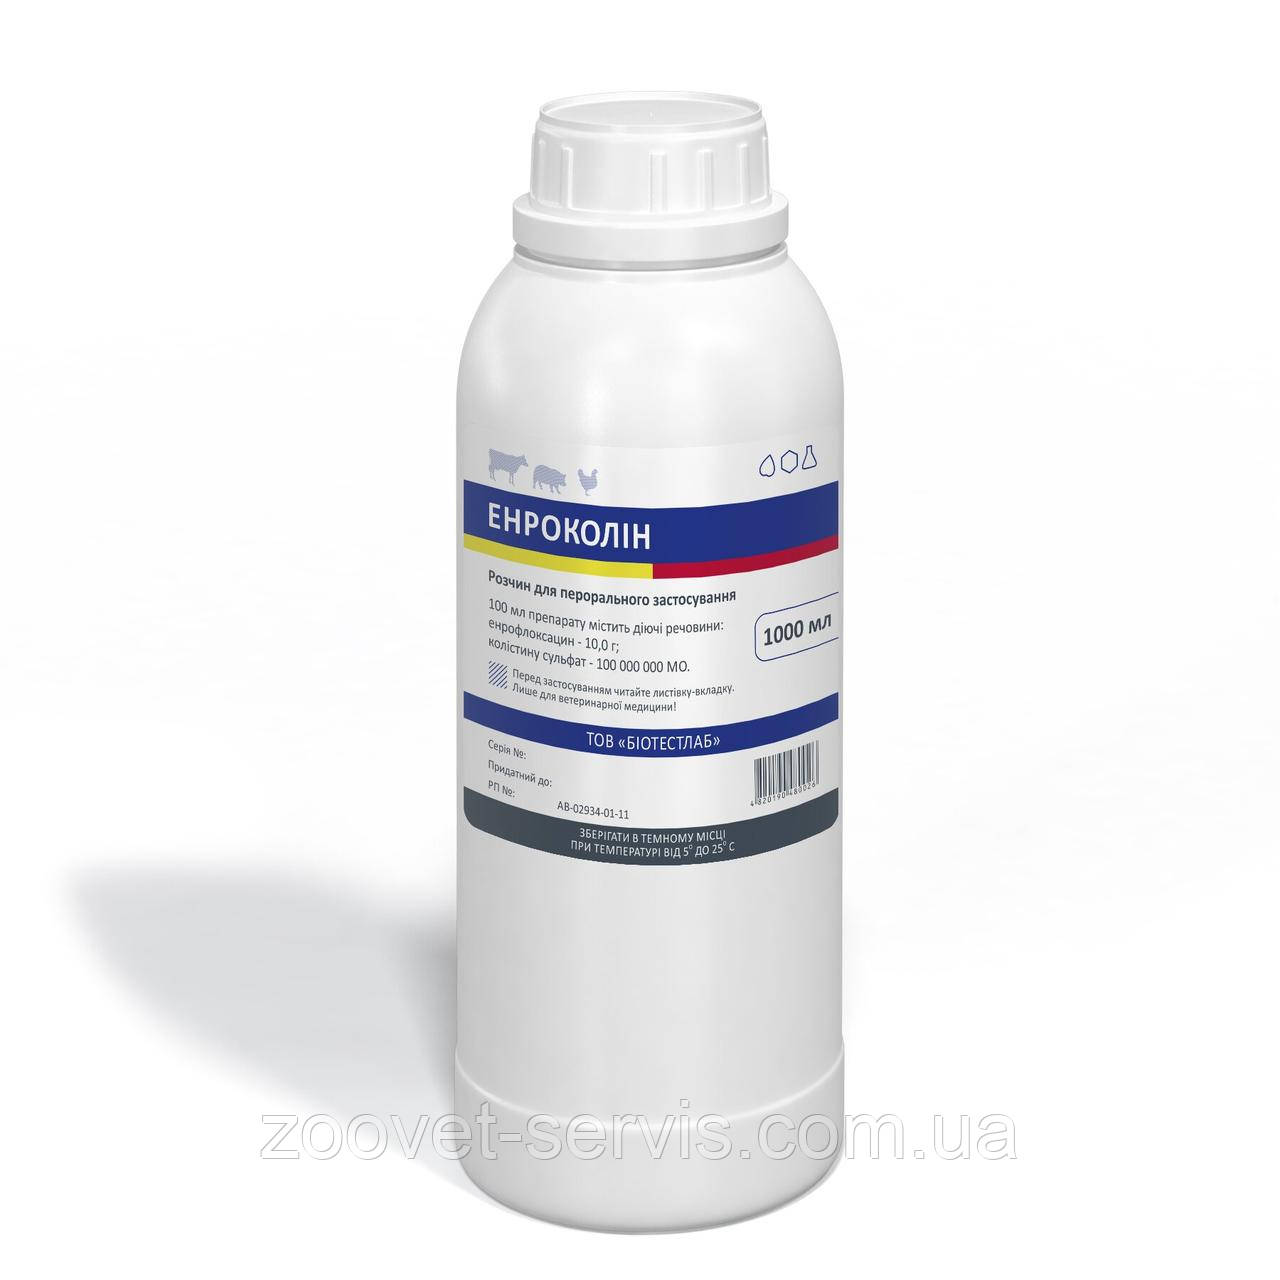 Энроколин (энрофлоксацин – 10,0 г,  колистина сульфат — 100 000 000 МЕ) 1л